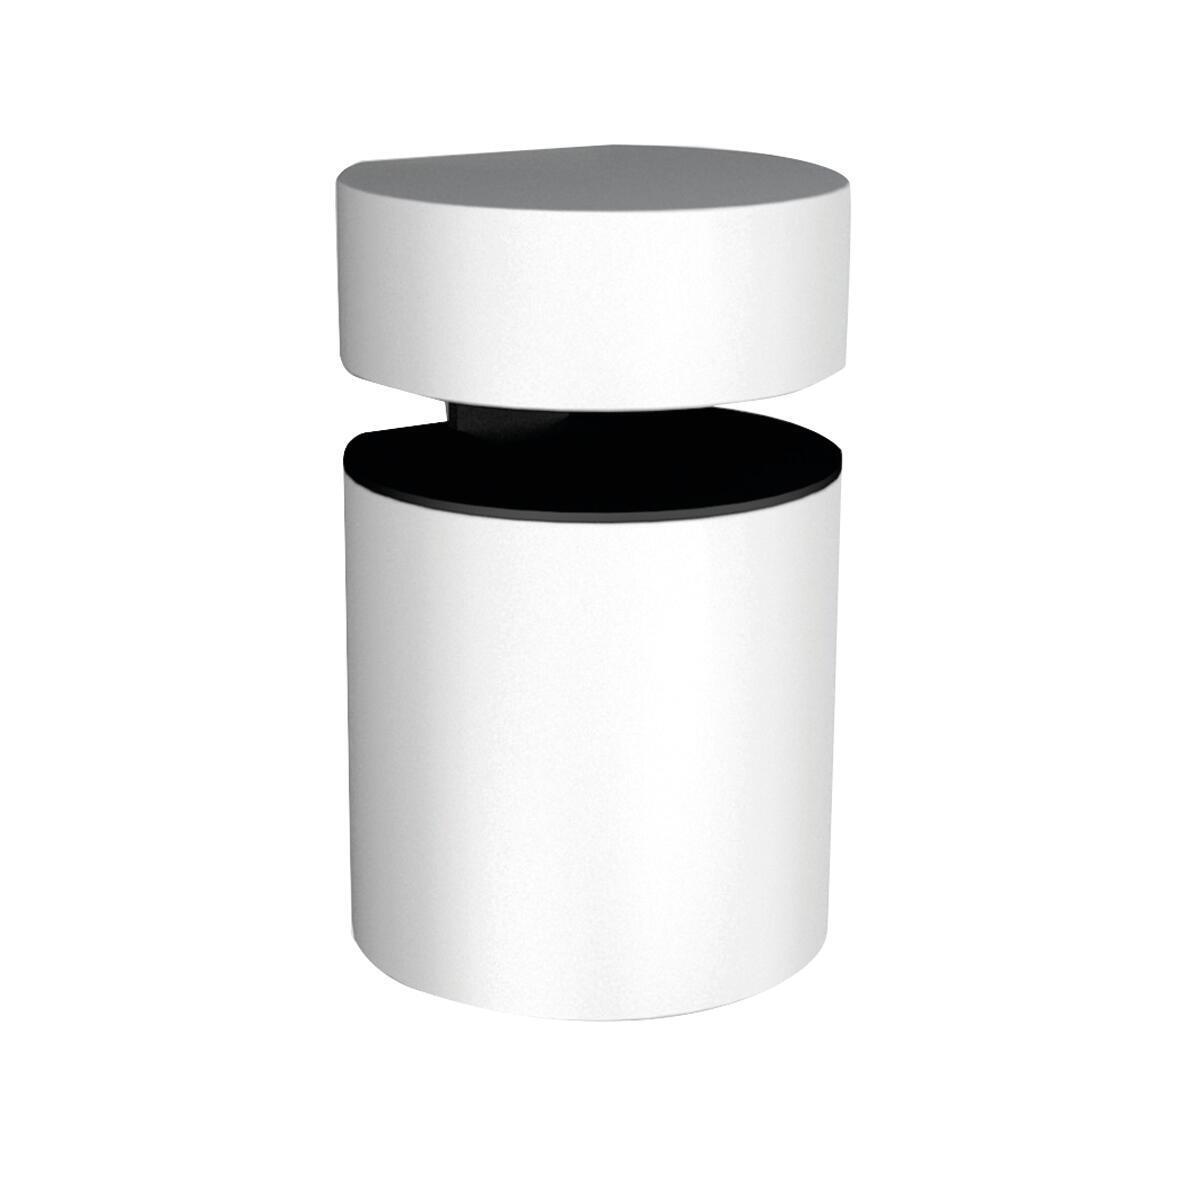 Reggimensola Basket L 3.8 x H 5 x P 32 cm bianco